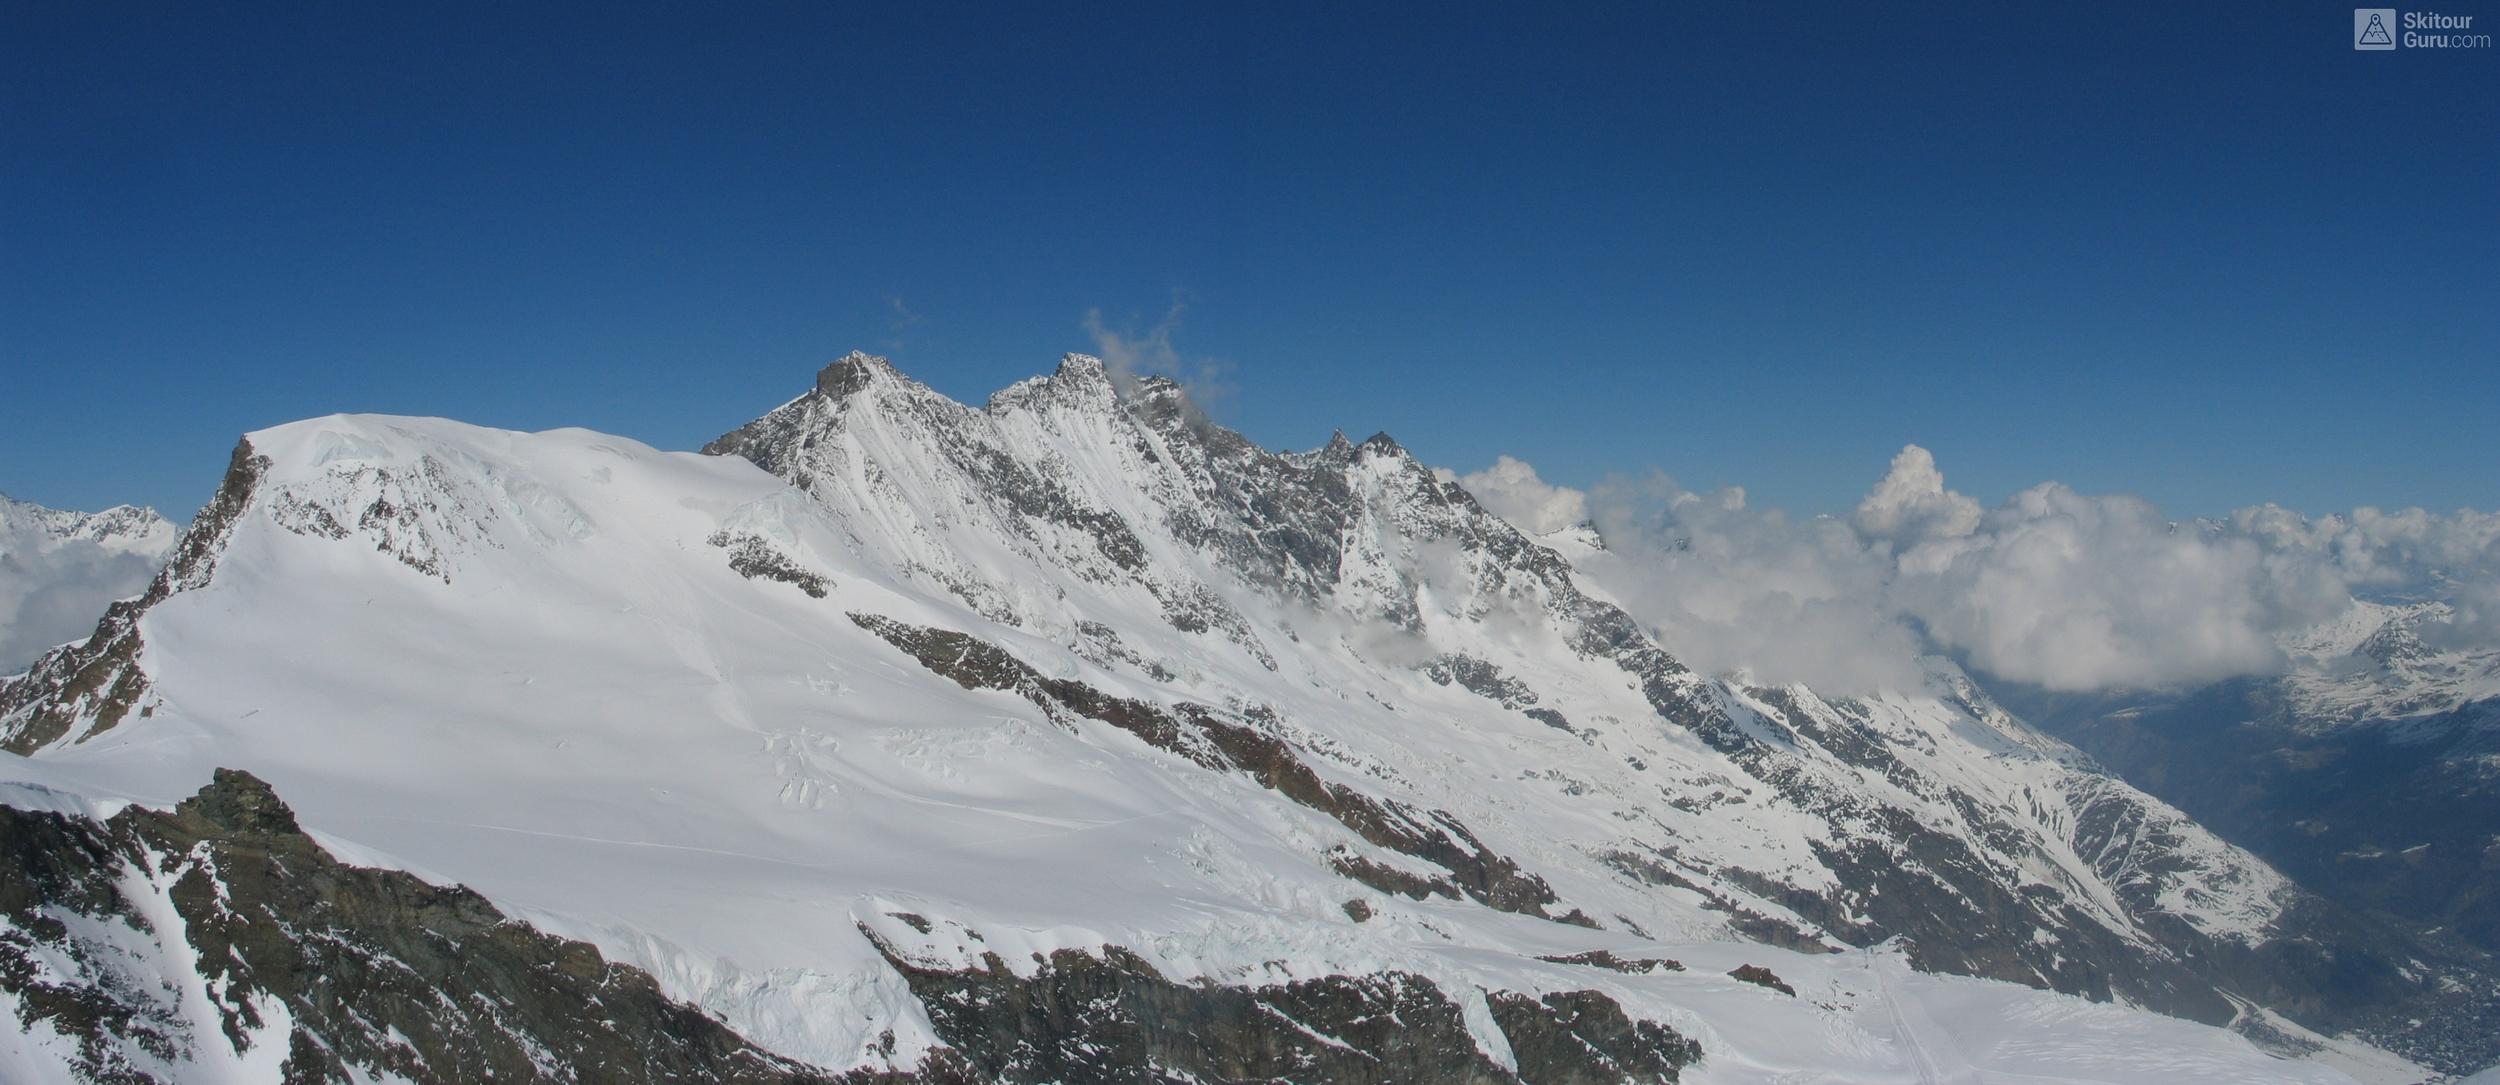 Allalinhorn Walliser Alpen / Alpes valaisannes Švýcarsko panorama 20